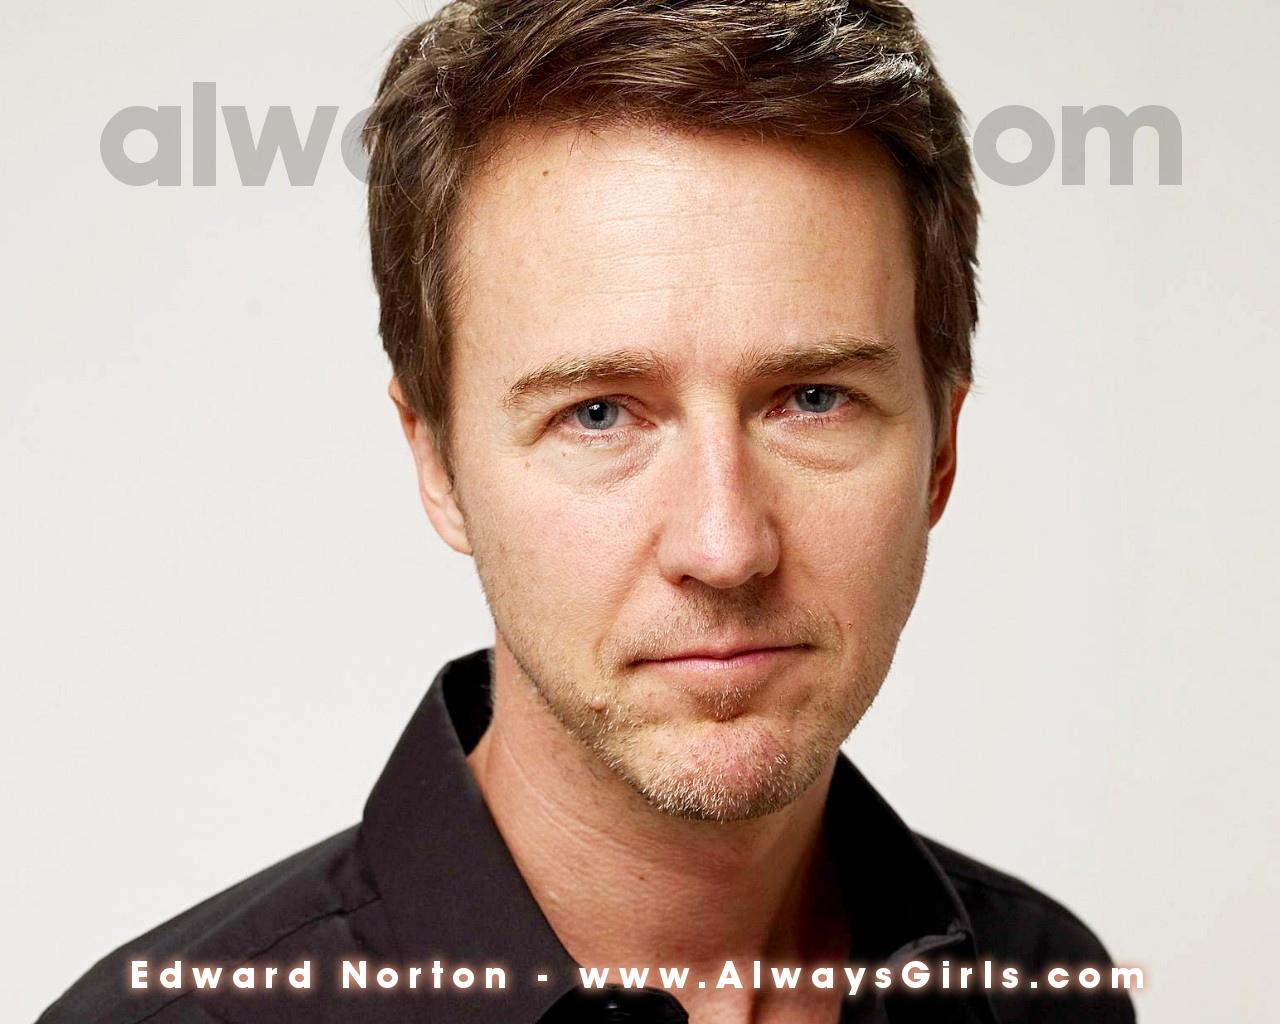 http://3.bp.blogspot.com/-FwDGeWLQP-I/TwKSOlmQLbI/AAAAAAAABXQ/7lp_IXdOAg8/s1600/edward-norton-background-5-769908.jpg